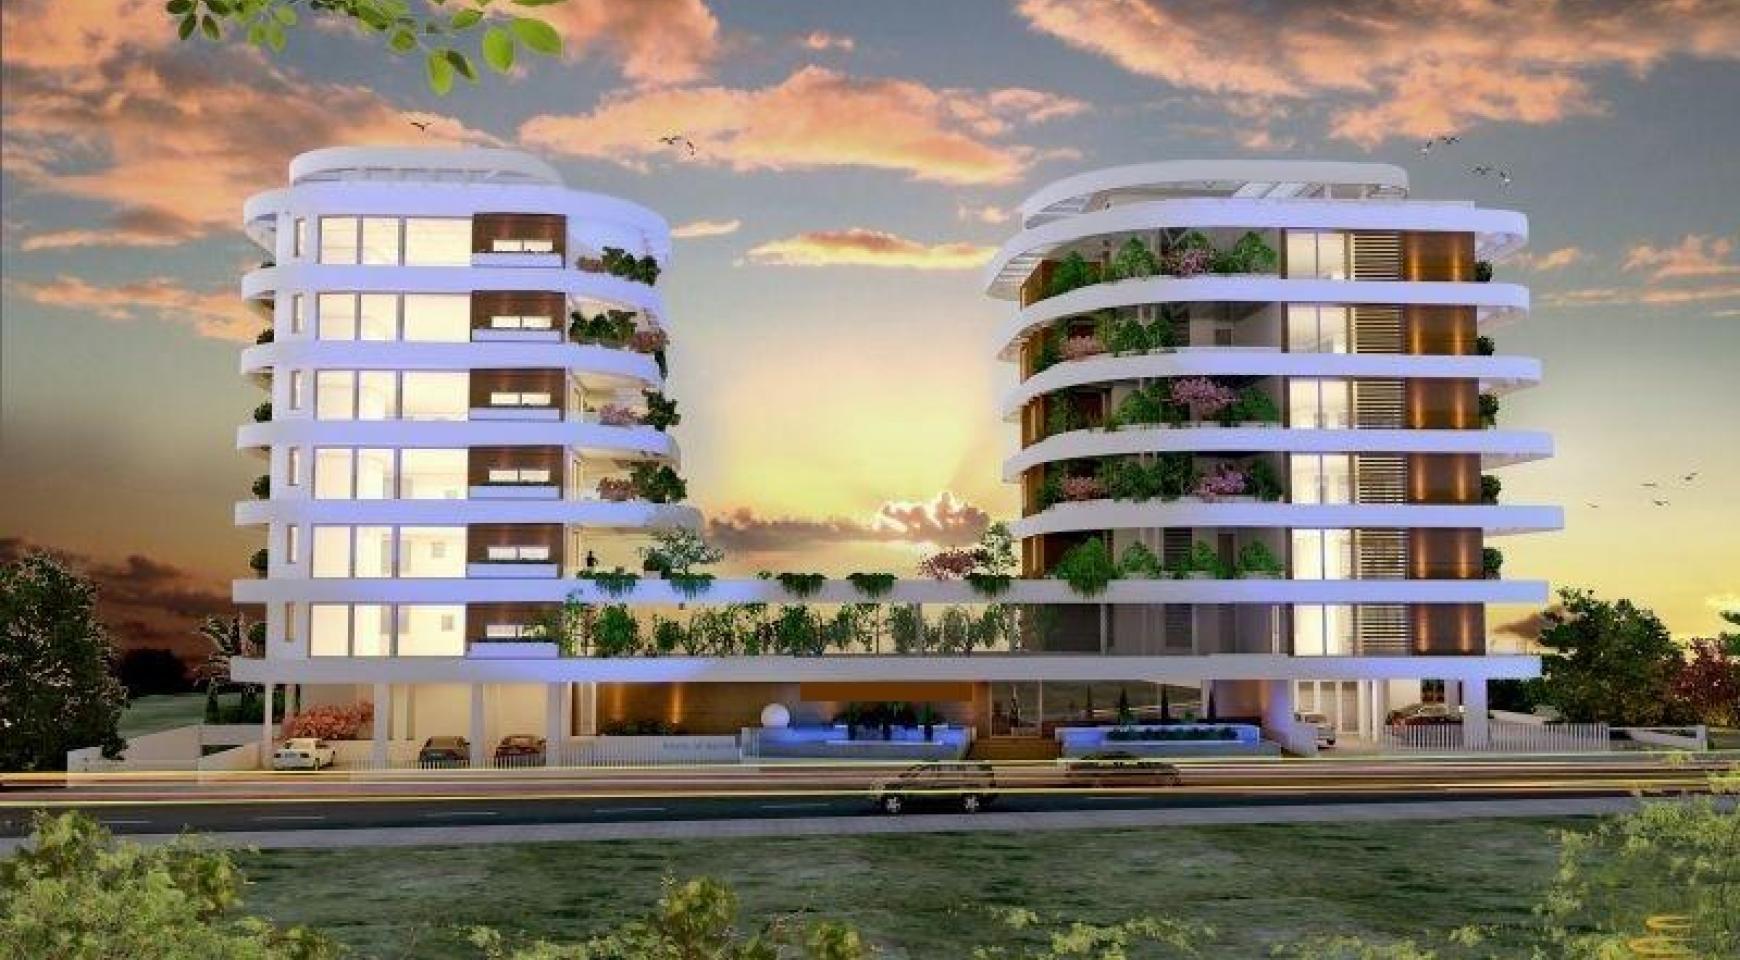 New 2 Bedroom Apartment near the Sea - 1